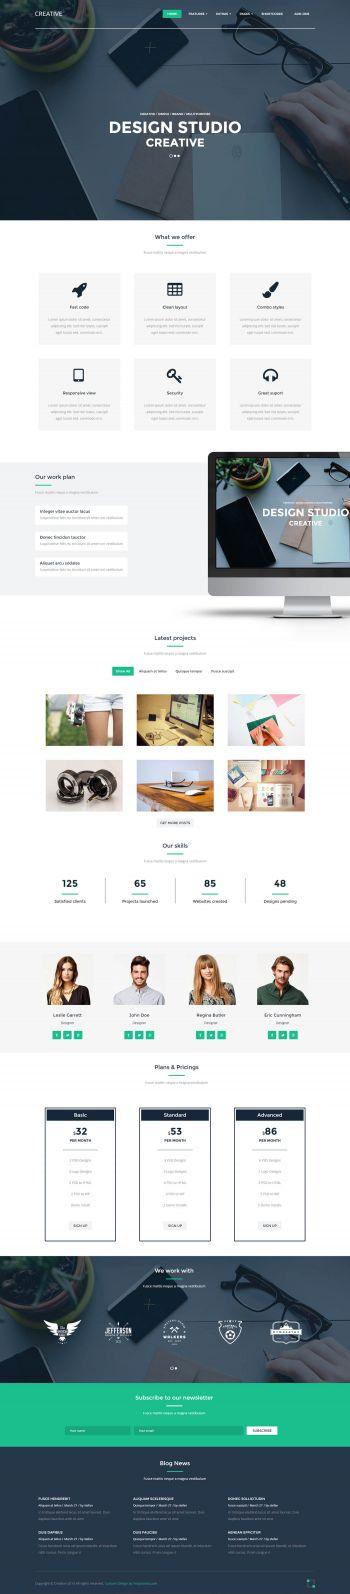 Creative - Designer Web Studio Joomla Template